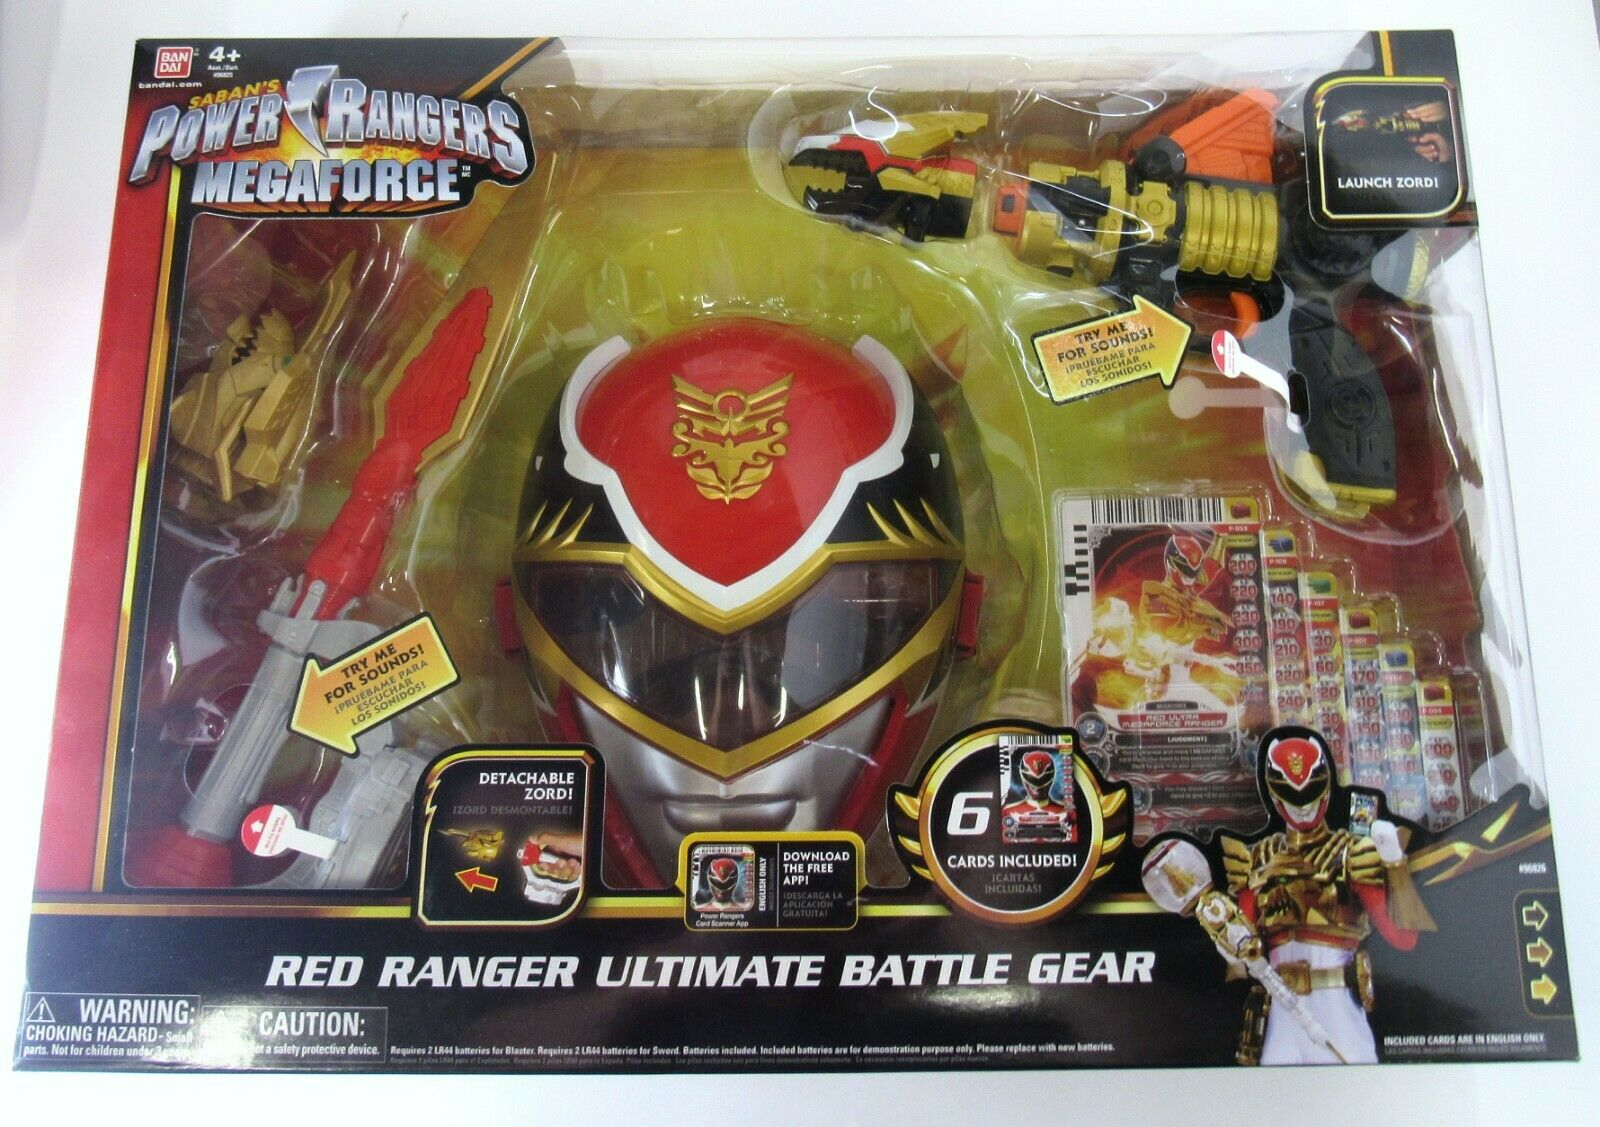 New    Bandai Power Rangers Megaforce Red Ranger Ultimate Battle Gear 2013 Rare 9953c0